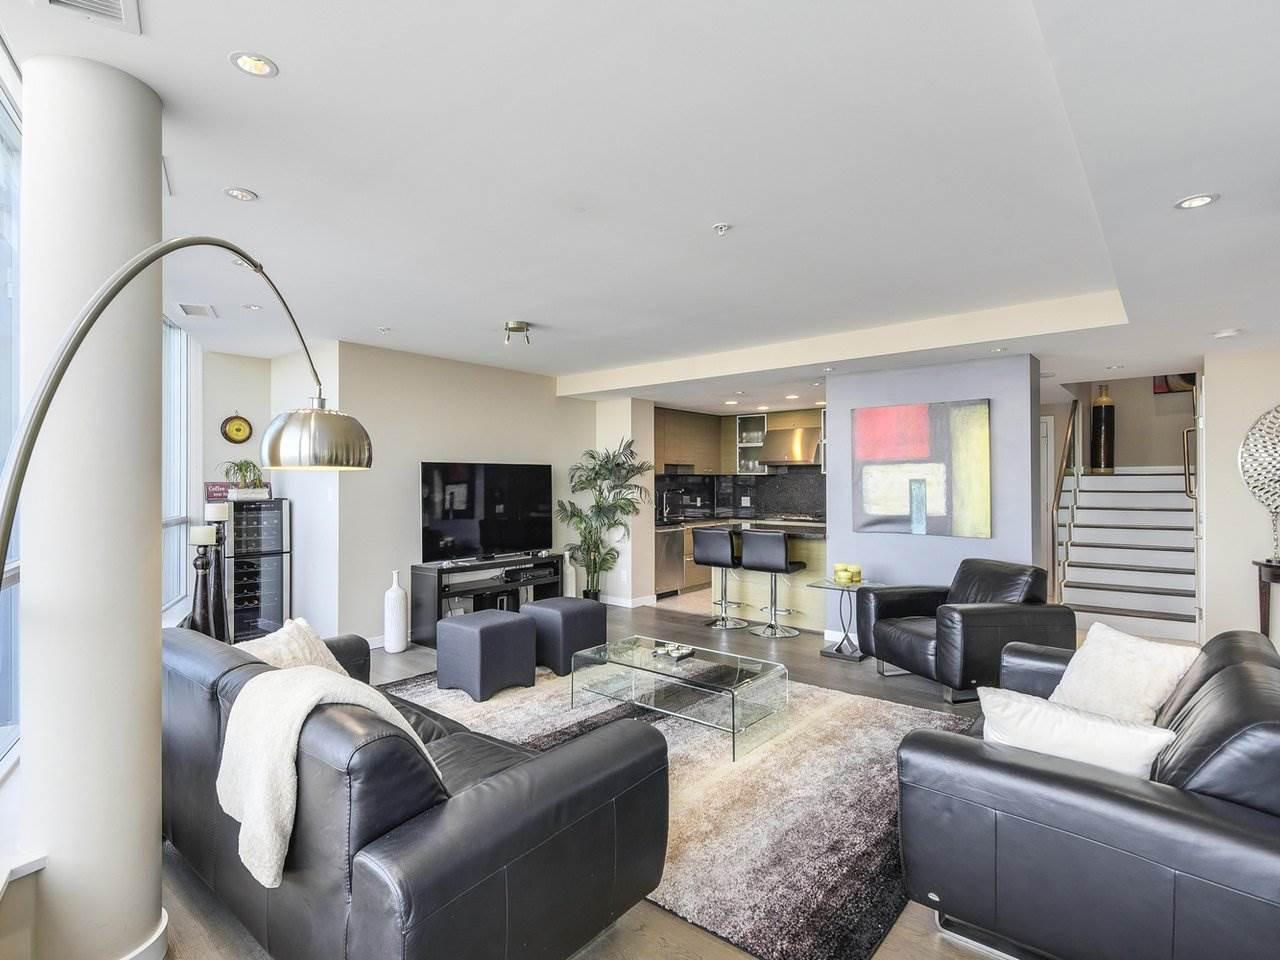 Condo Apartment at PH3 833 SEYMOUR STREET, Unit PH3, Vancouver West, British Columbia. Image 4